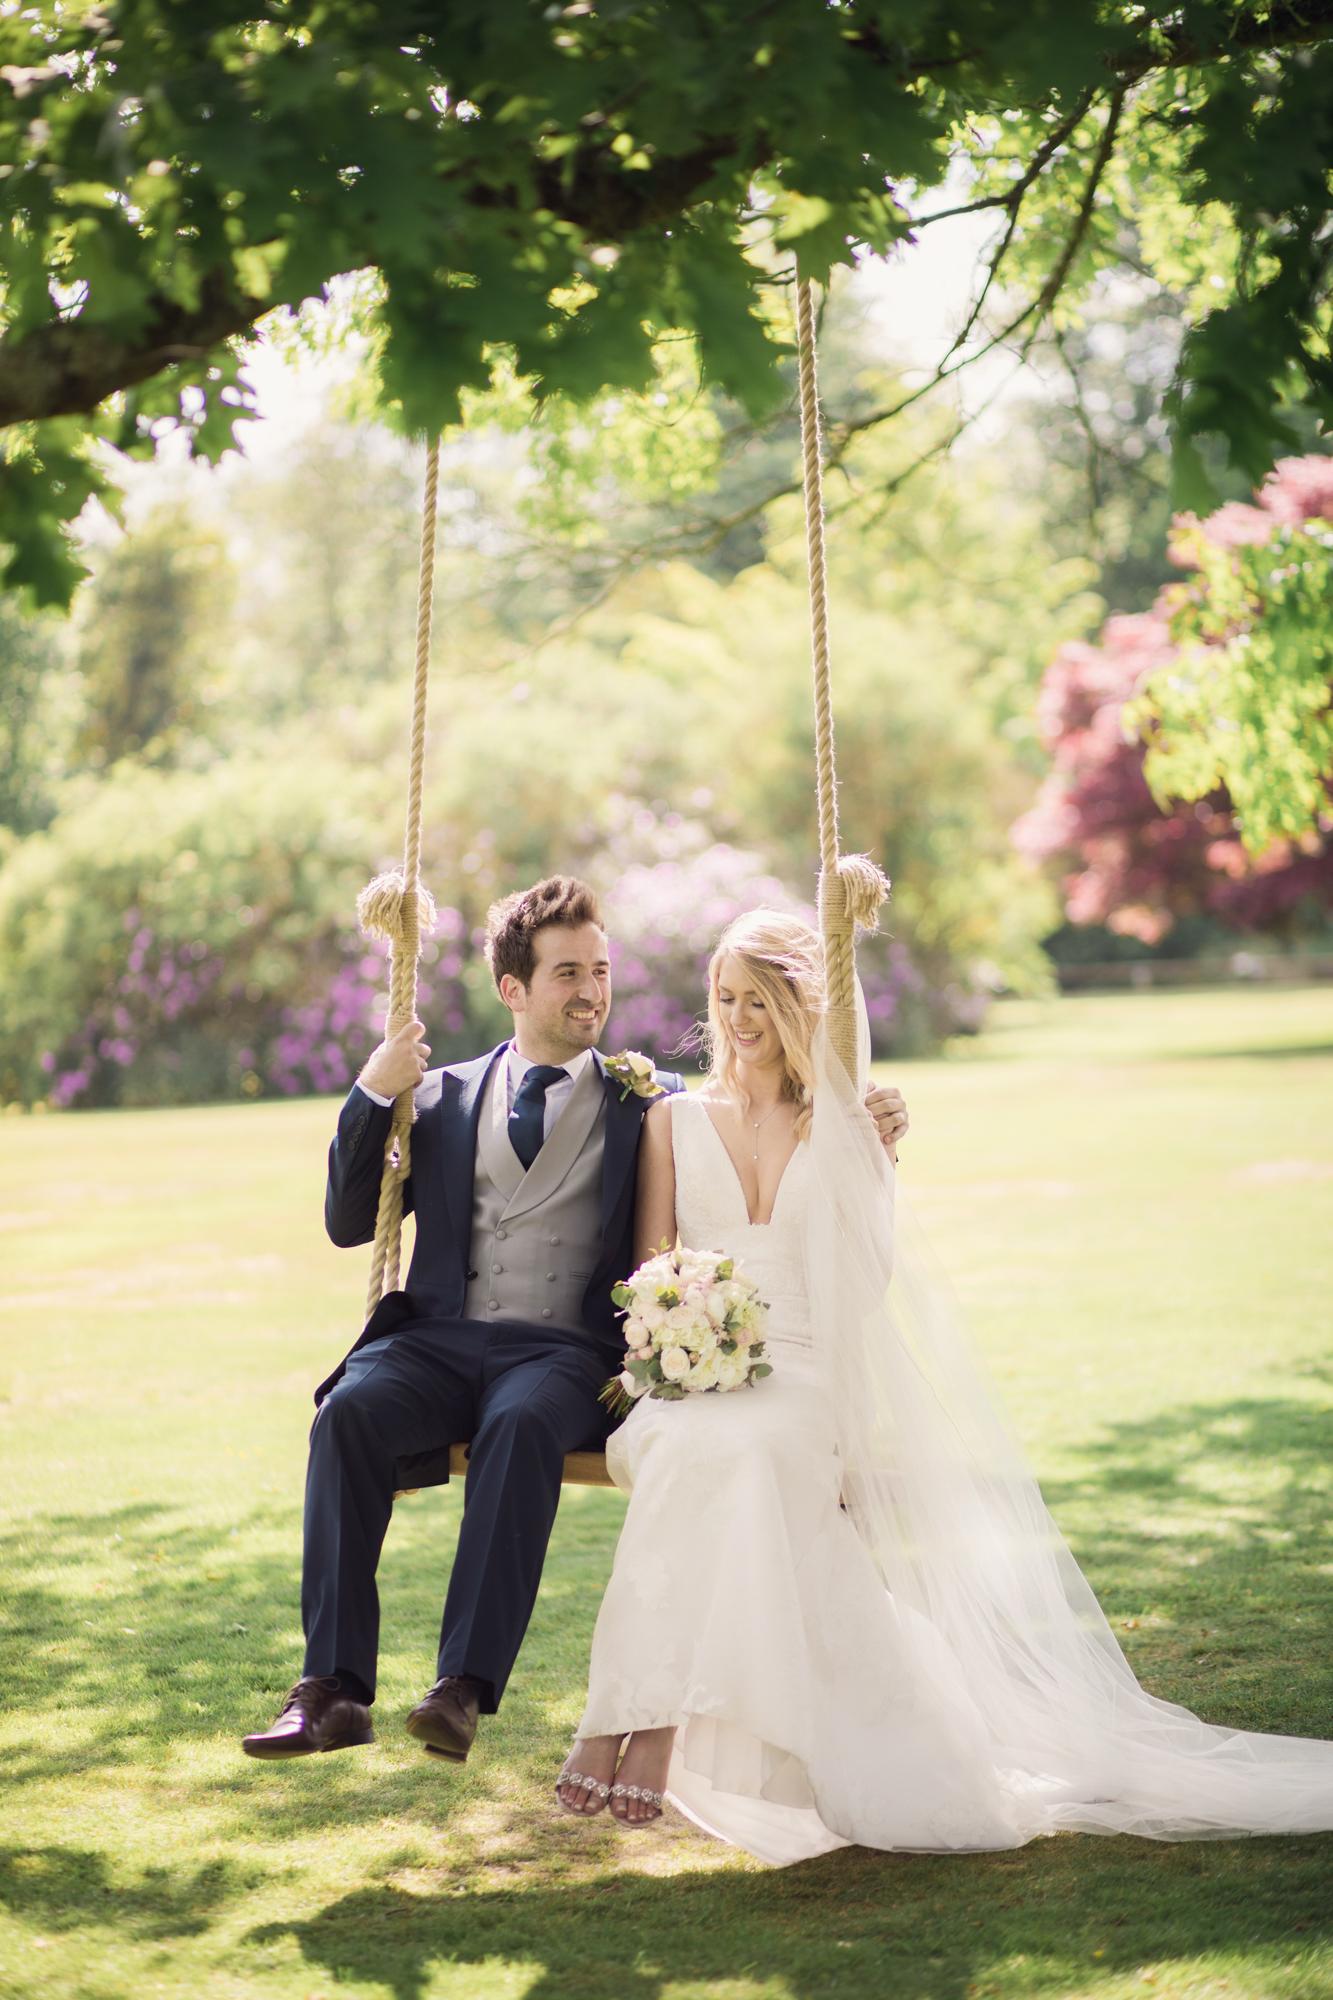 chilston park bride groom swing gardens